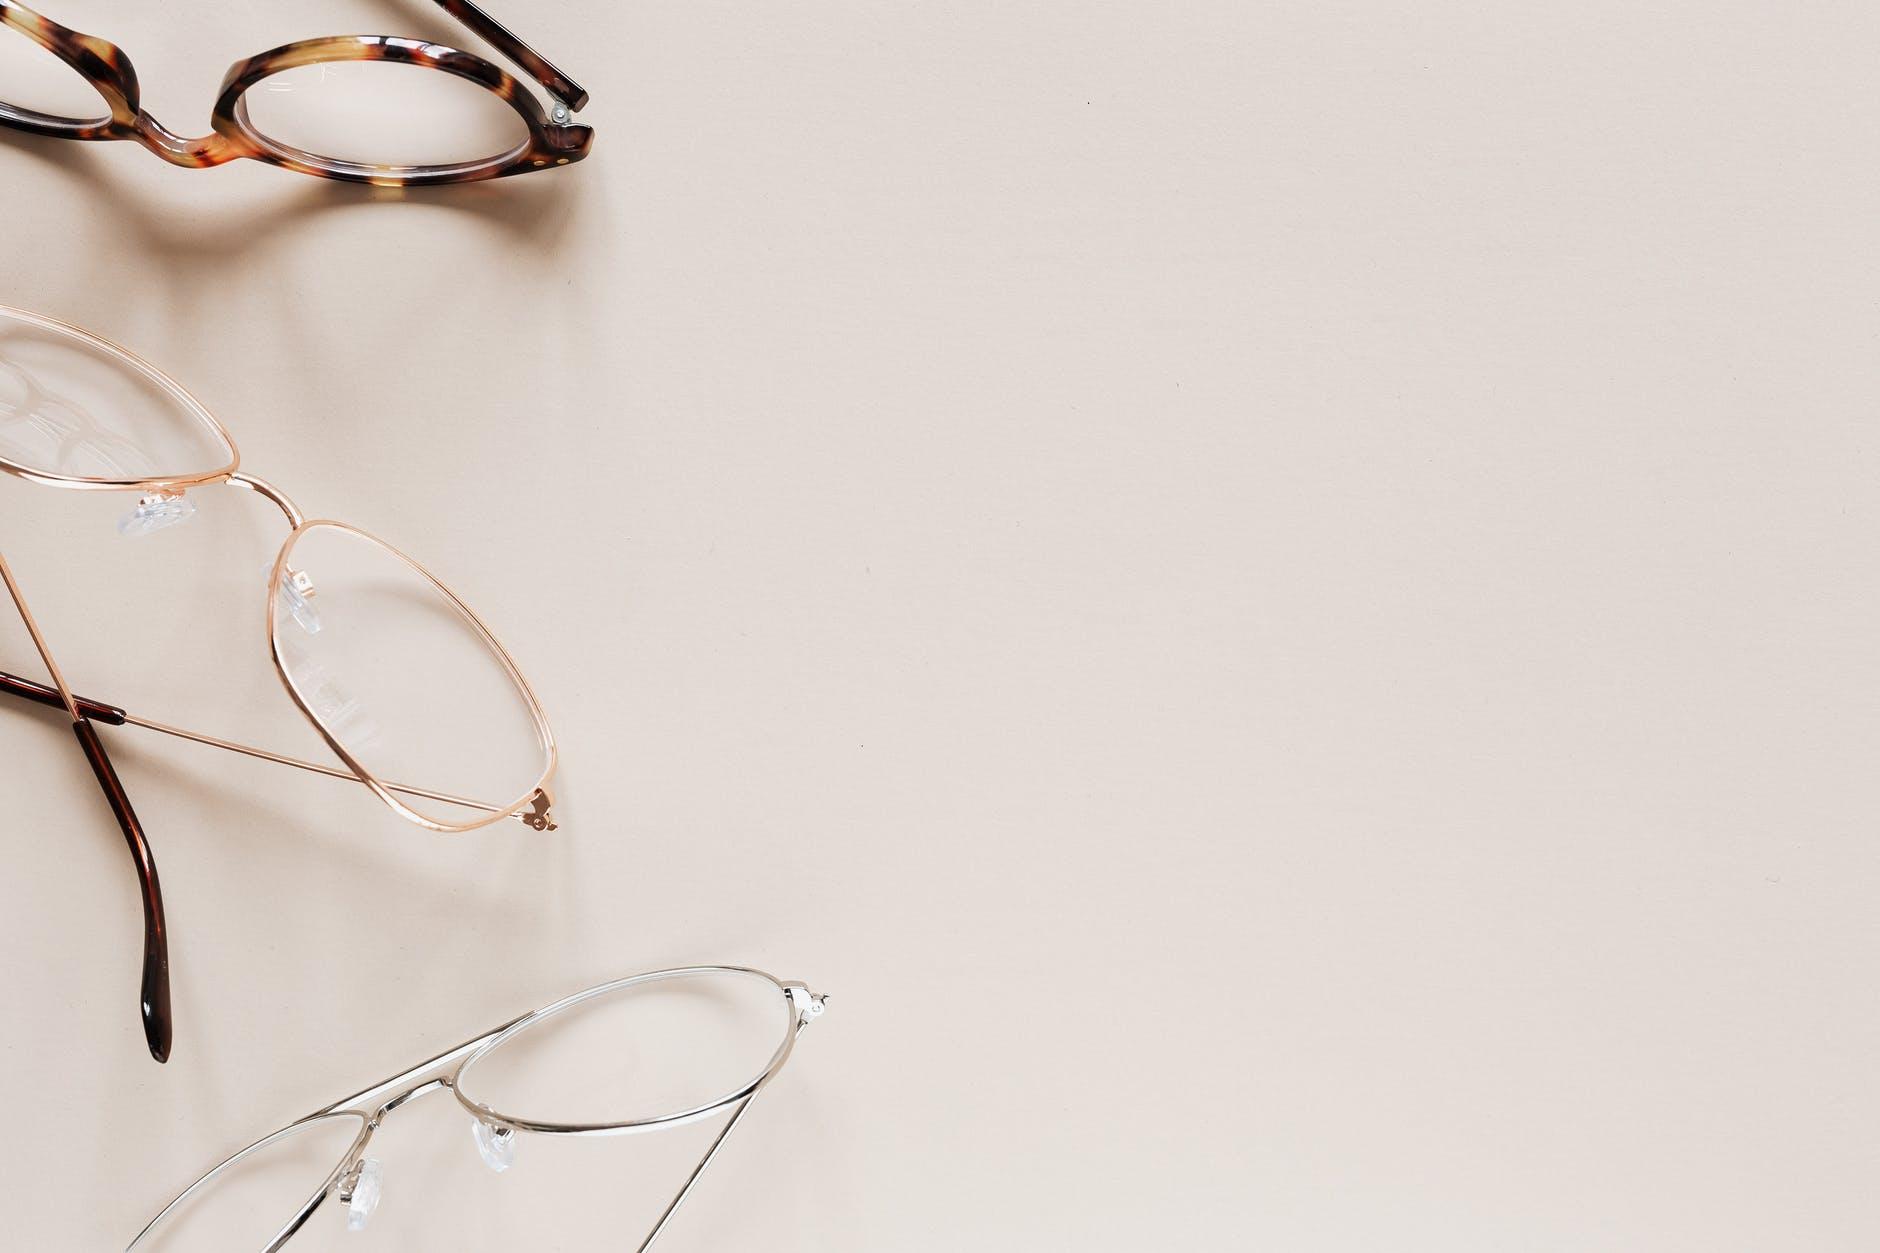 stylish various eyeglasses for vision correction